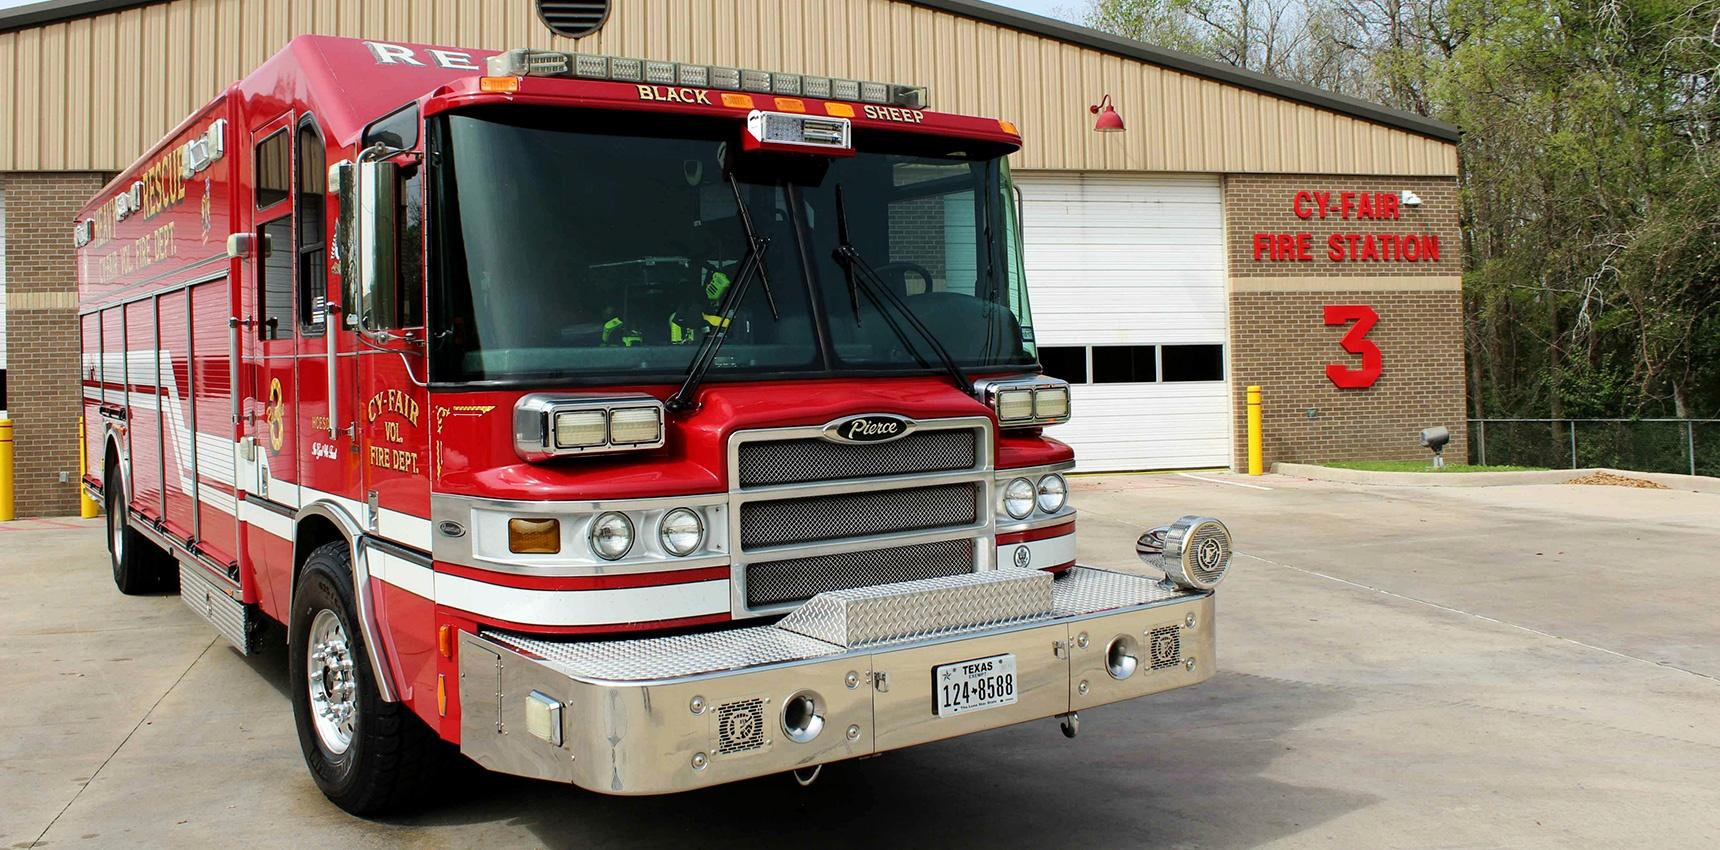 Harris-County-Emergency-Services-District-in-Texas-Purchases-Ten-Pierce-Quantum-Apparatus_Header.jpg